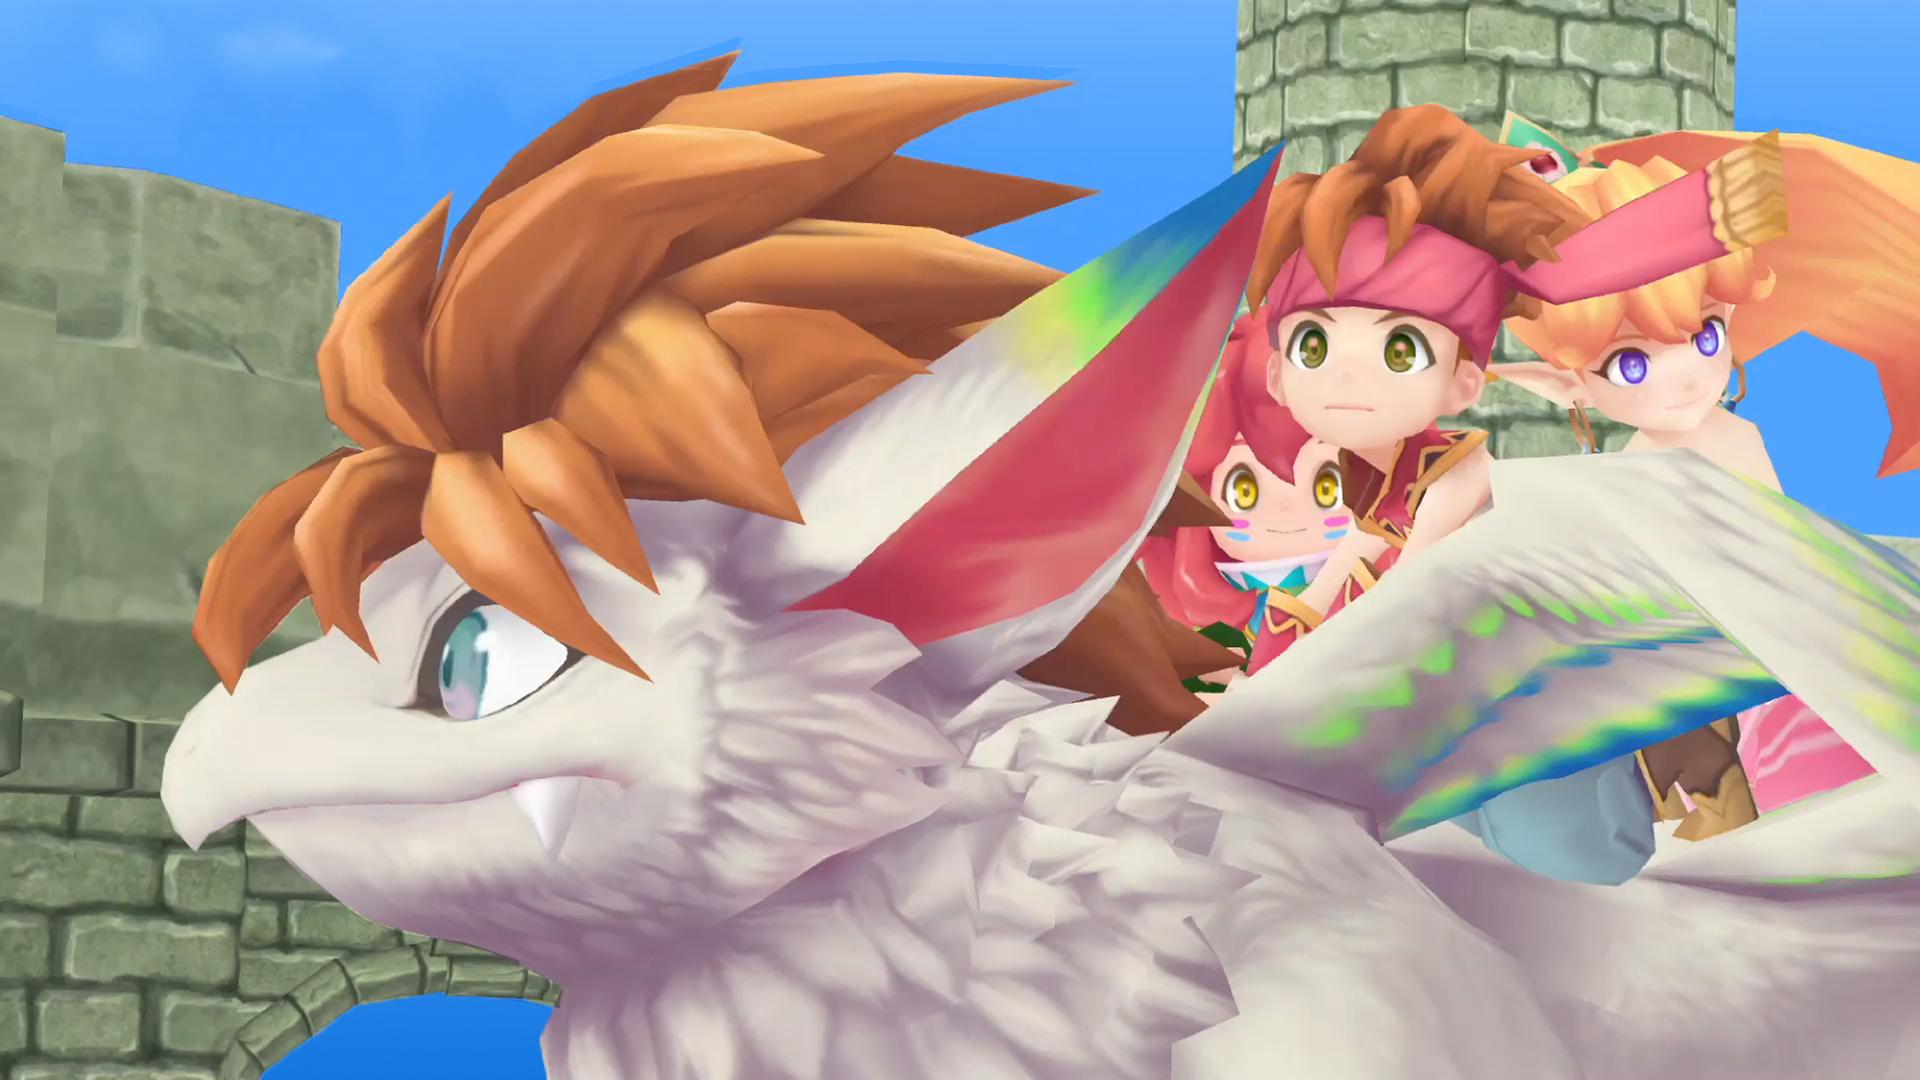 Secret of Mana - cutscene